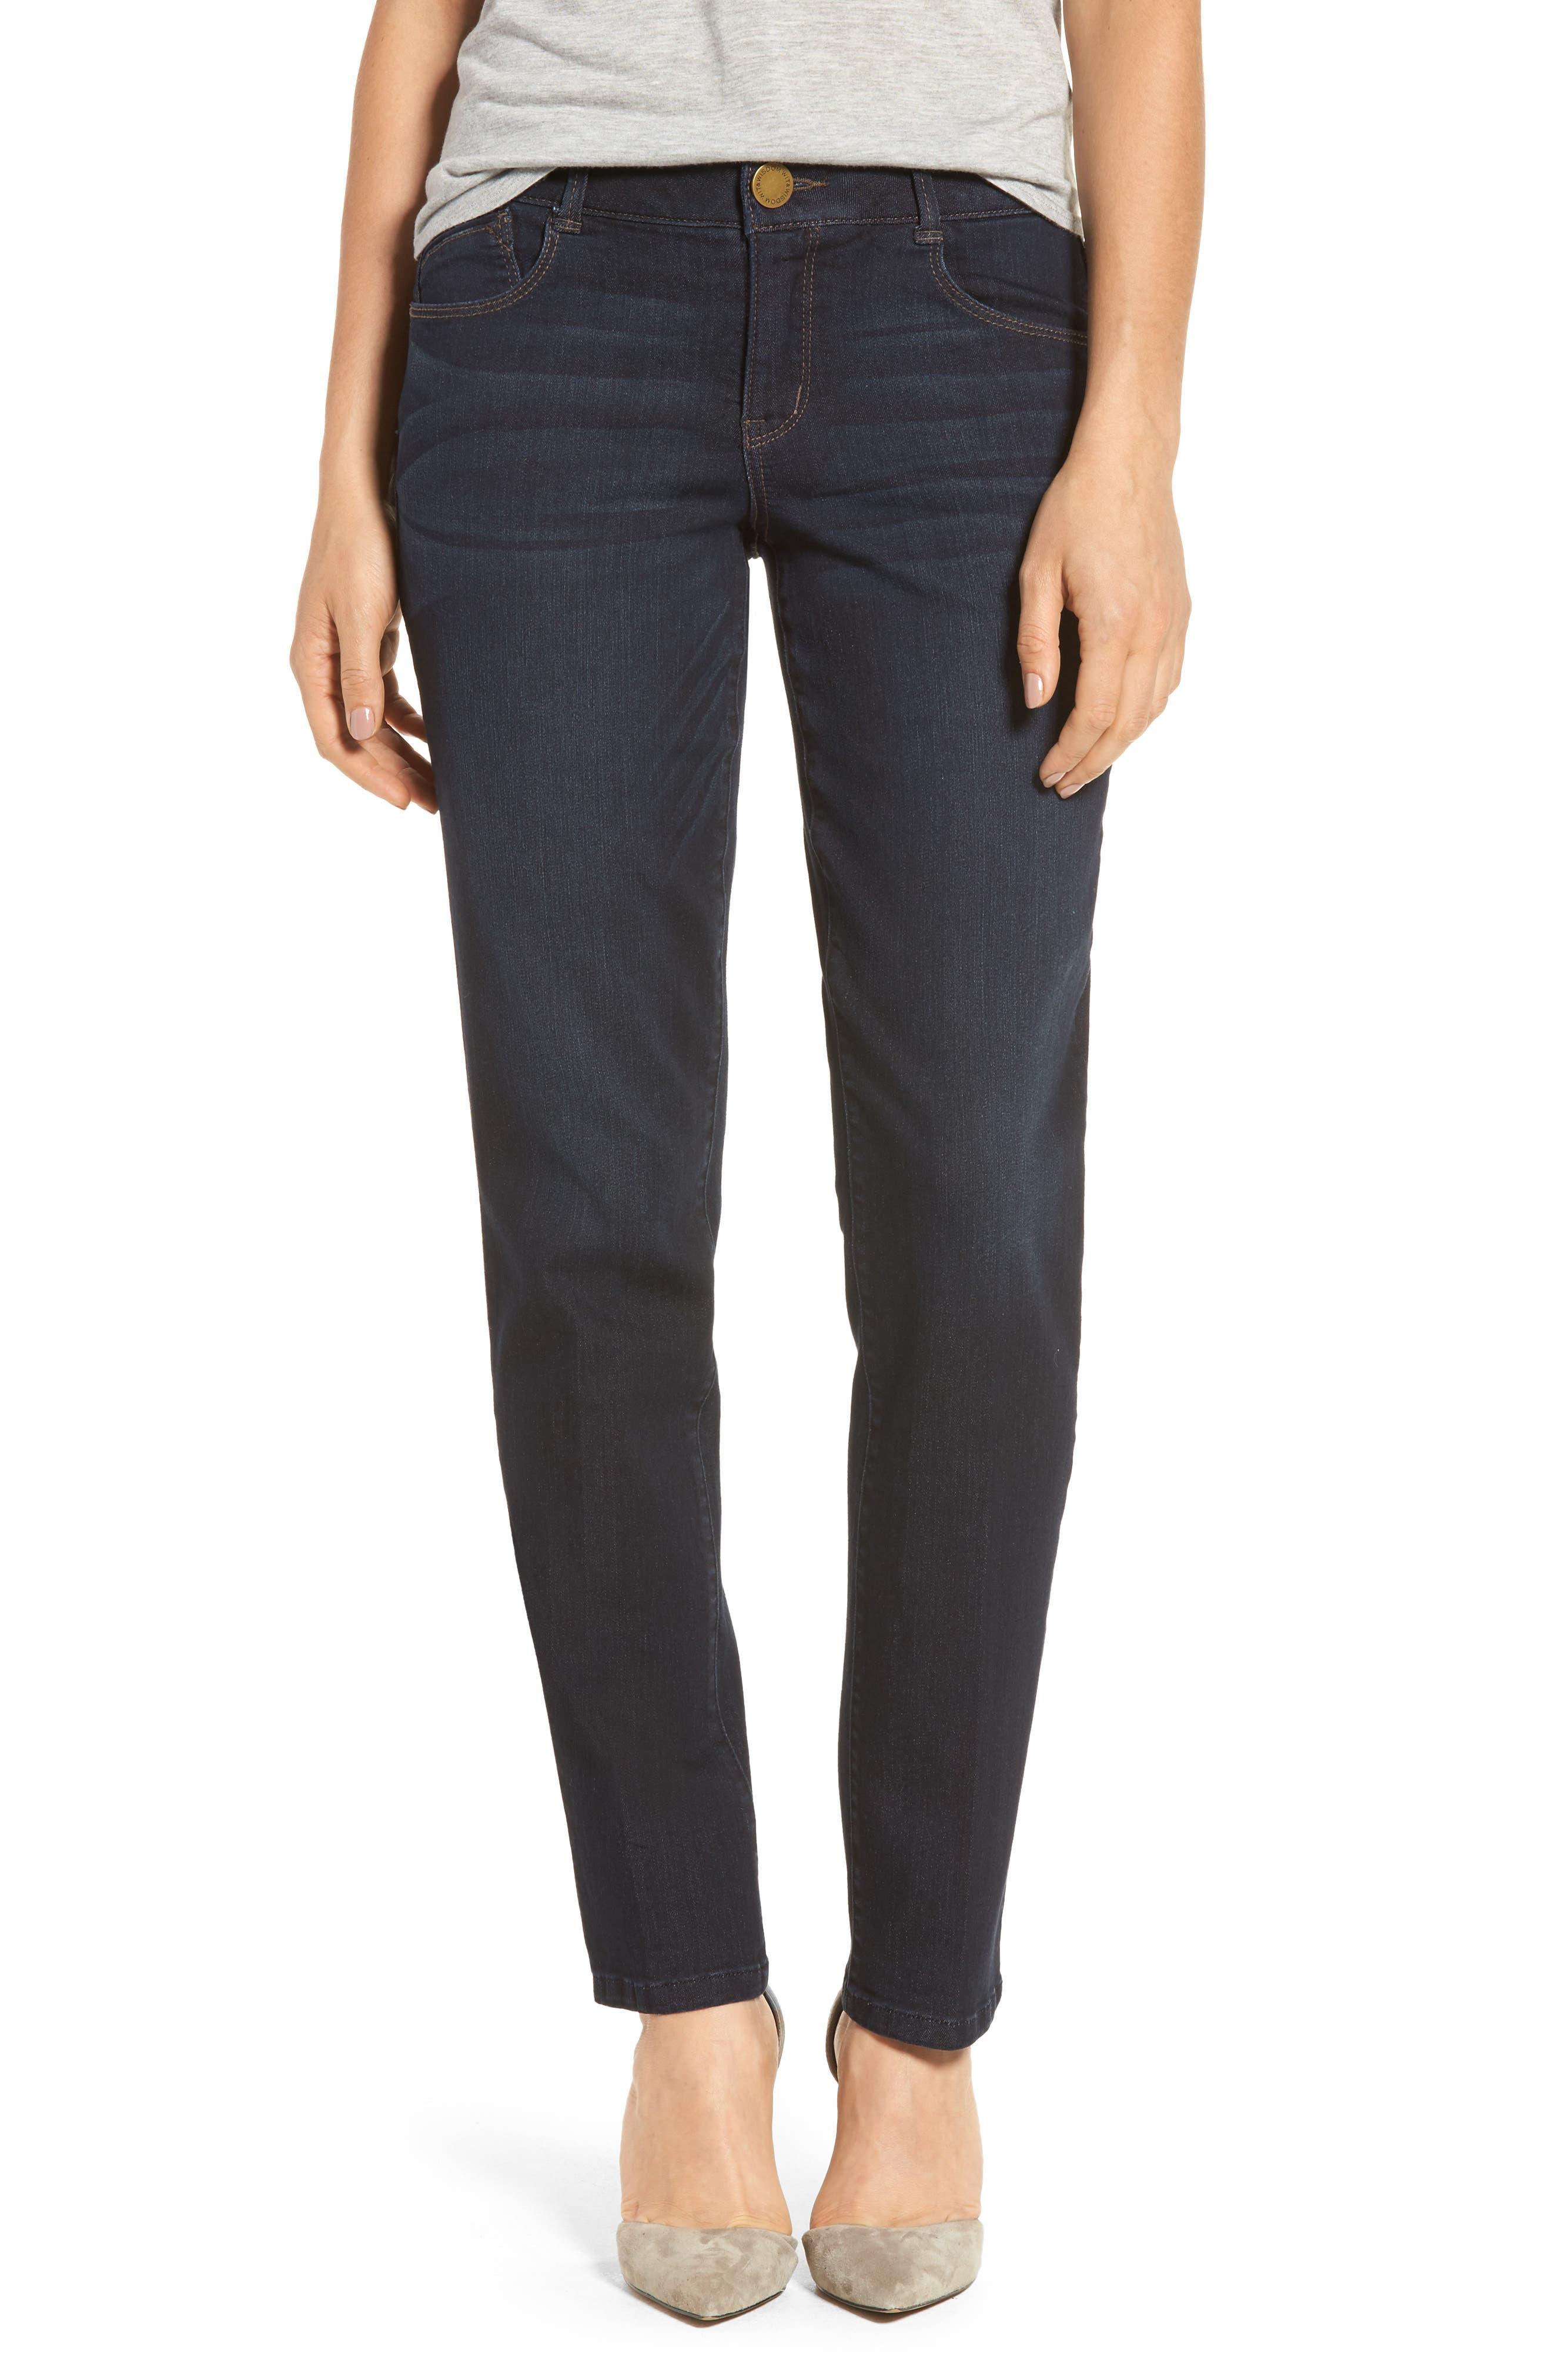 Ab-solution Straight Leg Jeans,                         Main,                         color, Indigo